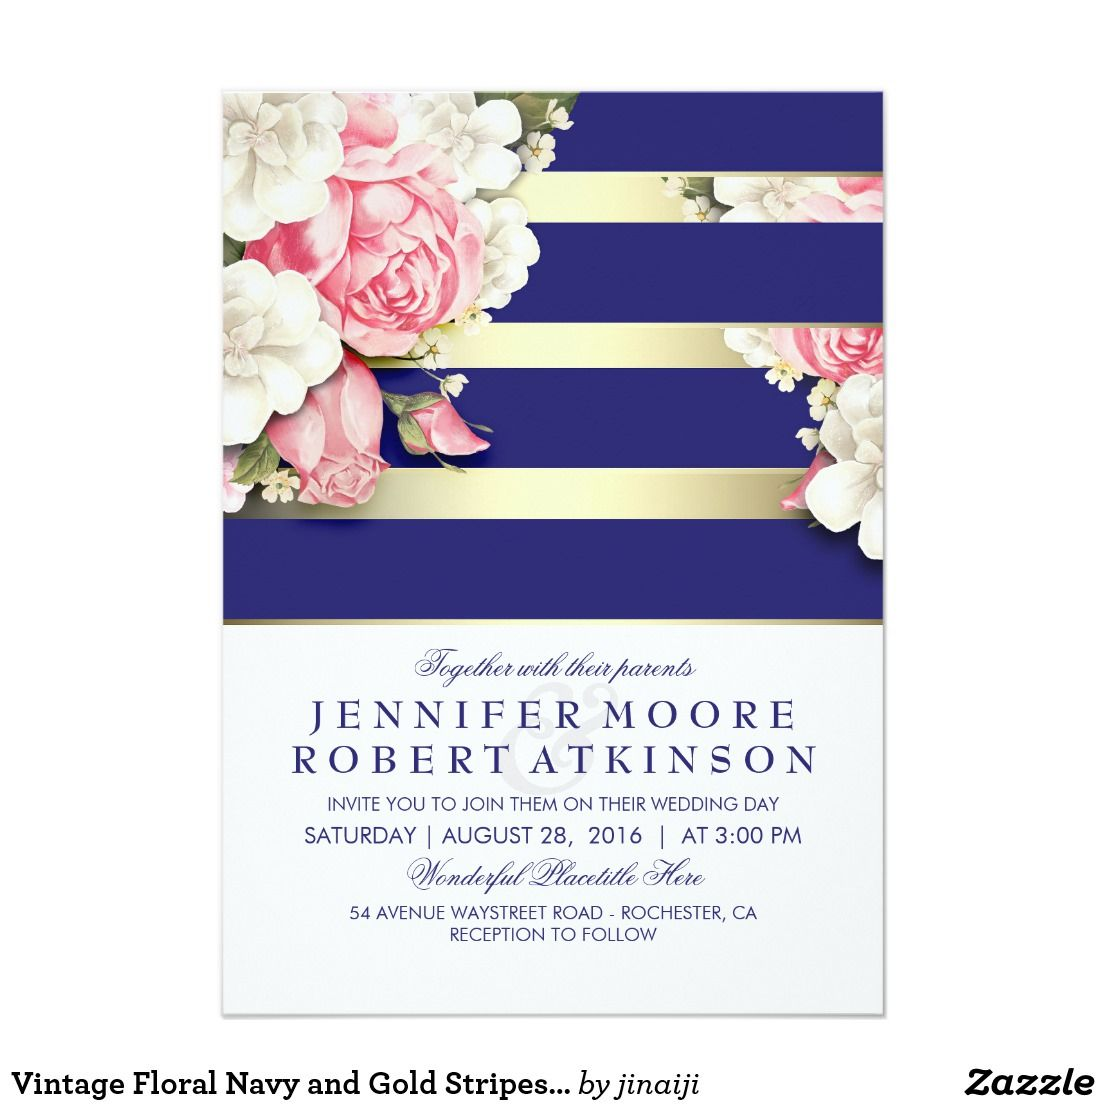 Vintage Floral Navy and Gold Stripes Wedding Card | Gold stripes ...